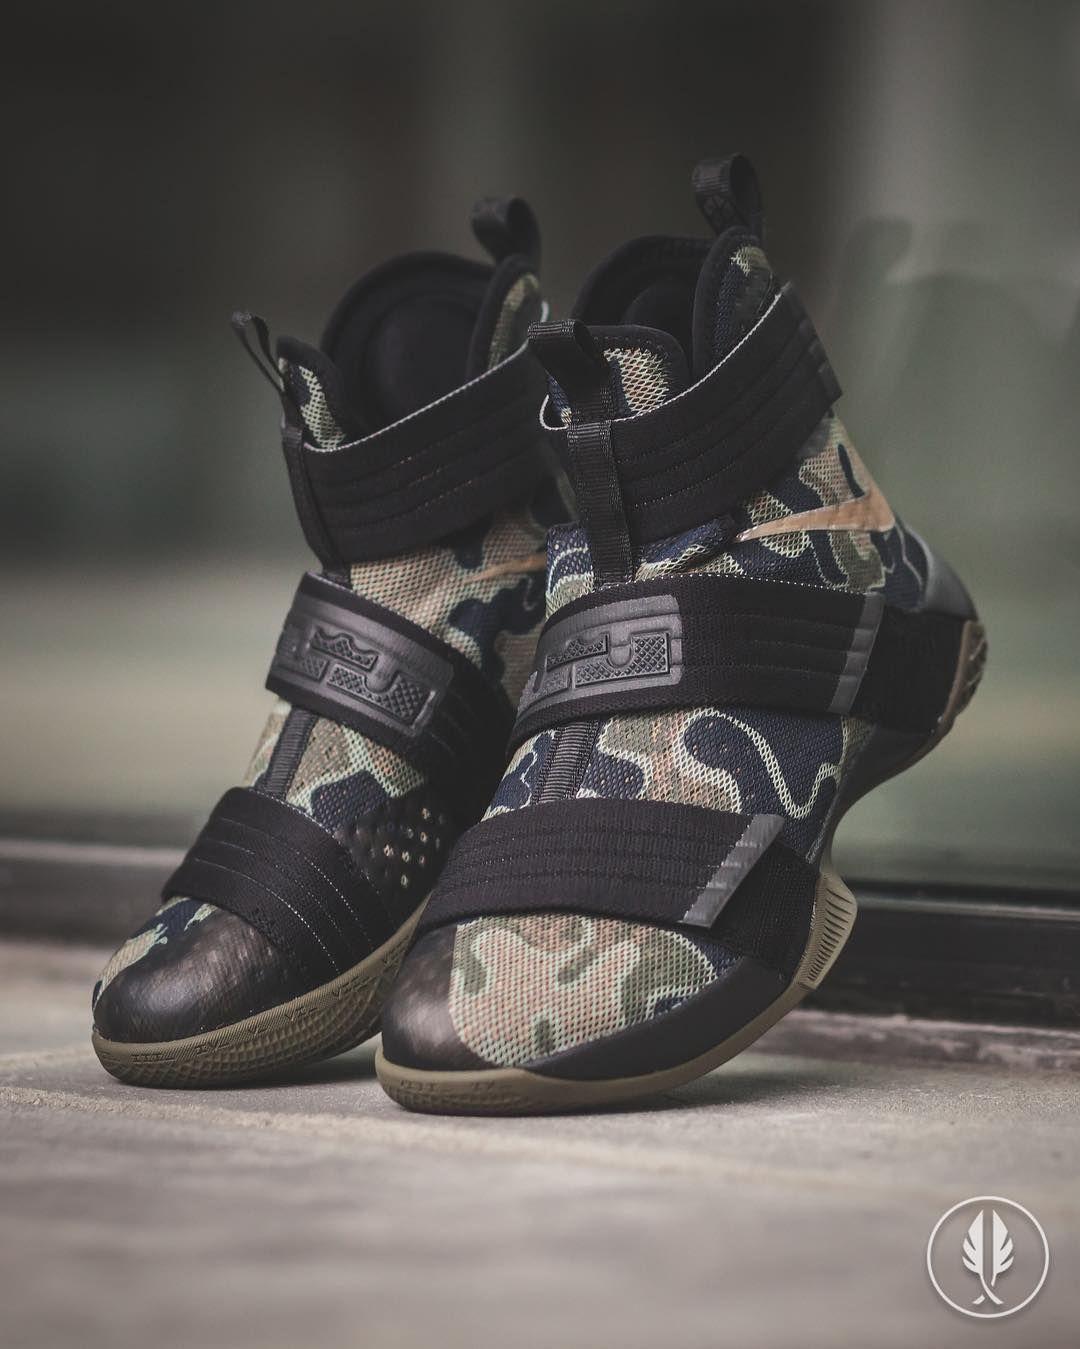 ea7e24a82e136 nike-lebron-soldier-12-military-camo